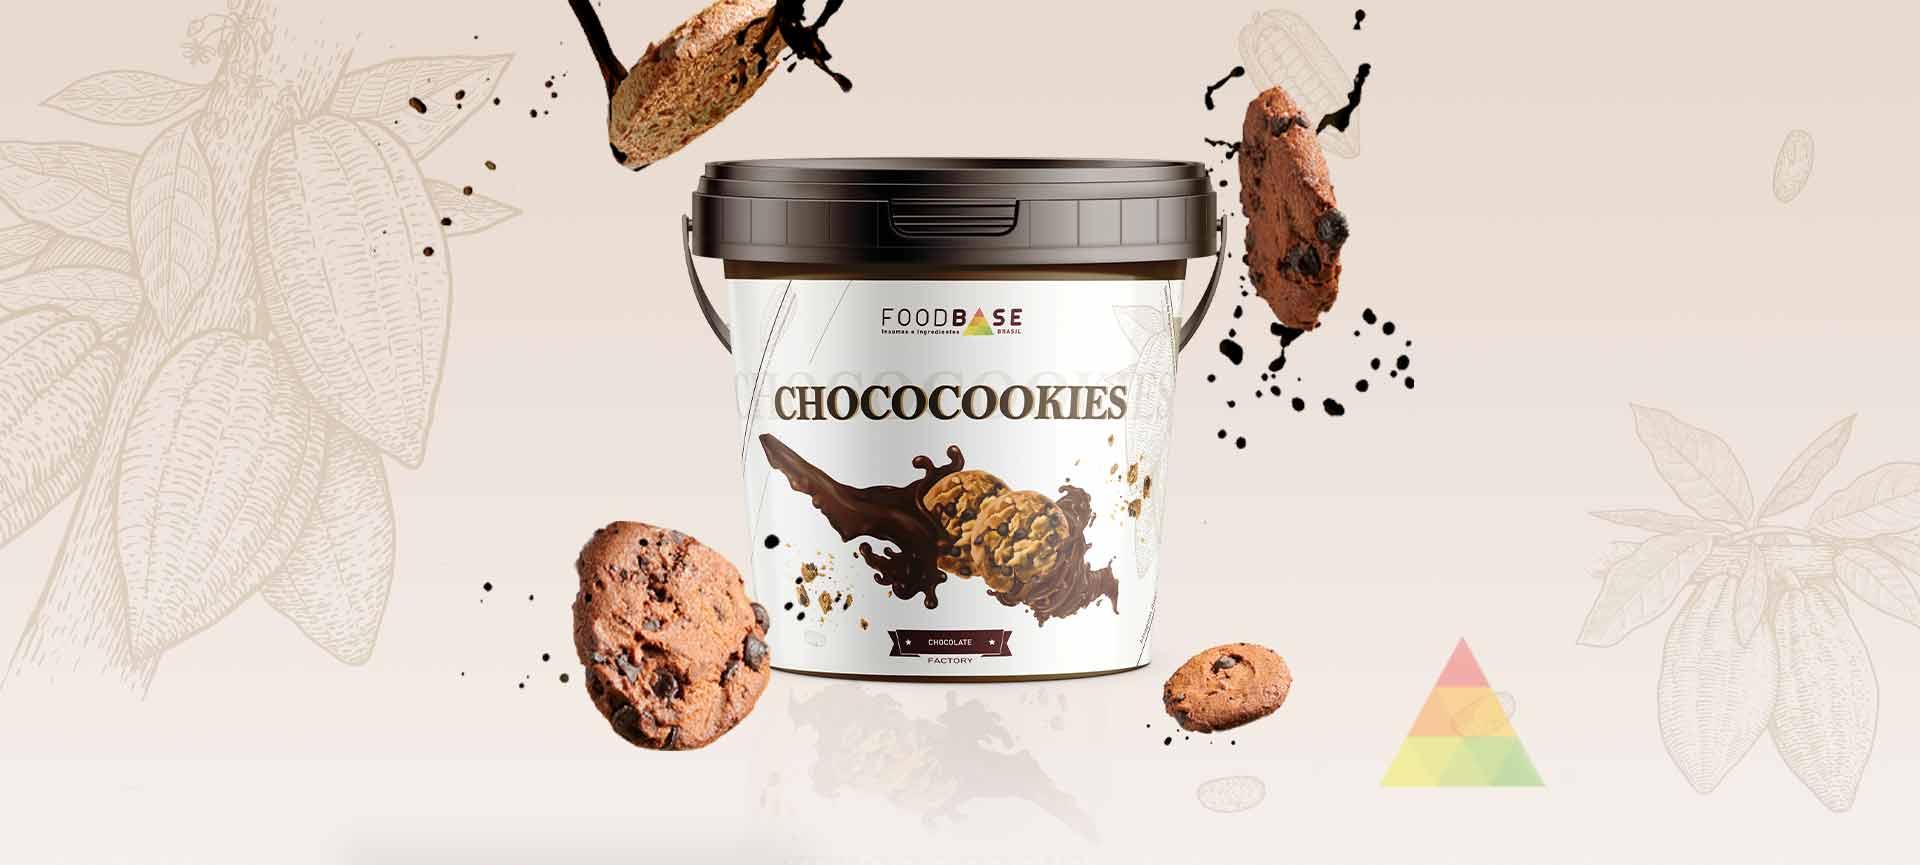 Foodbase - Receitas com Chococookies